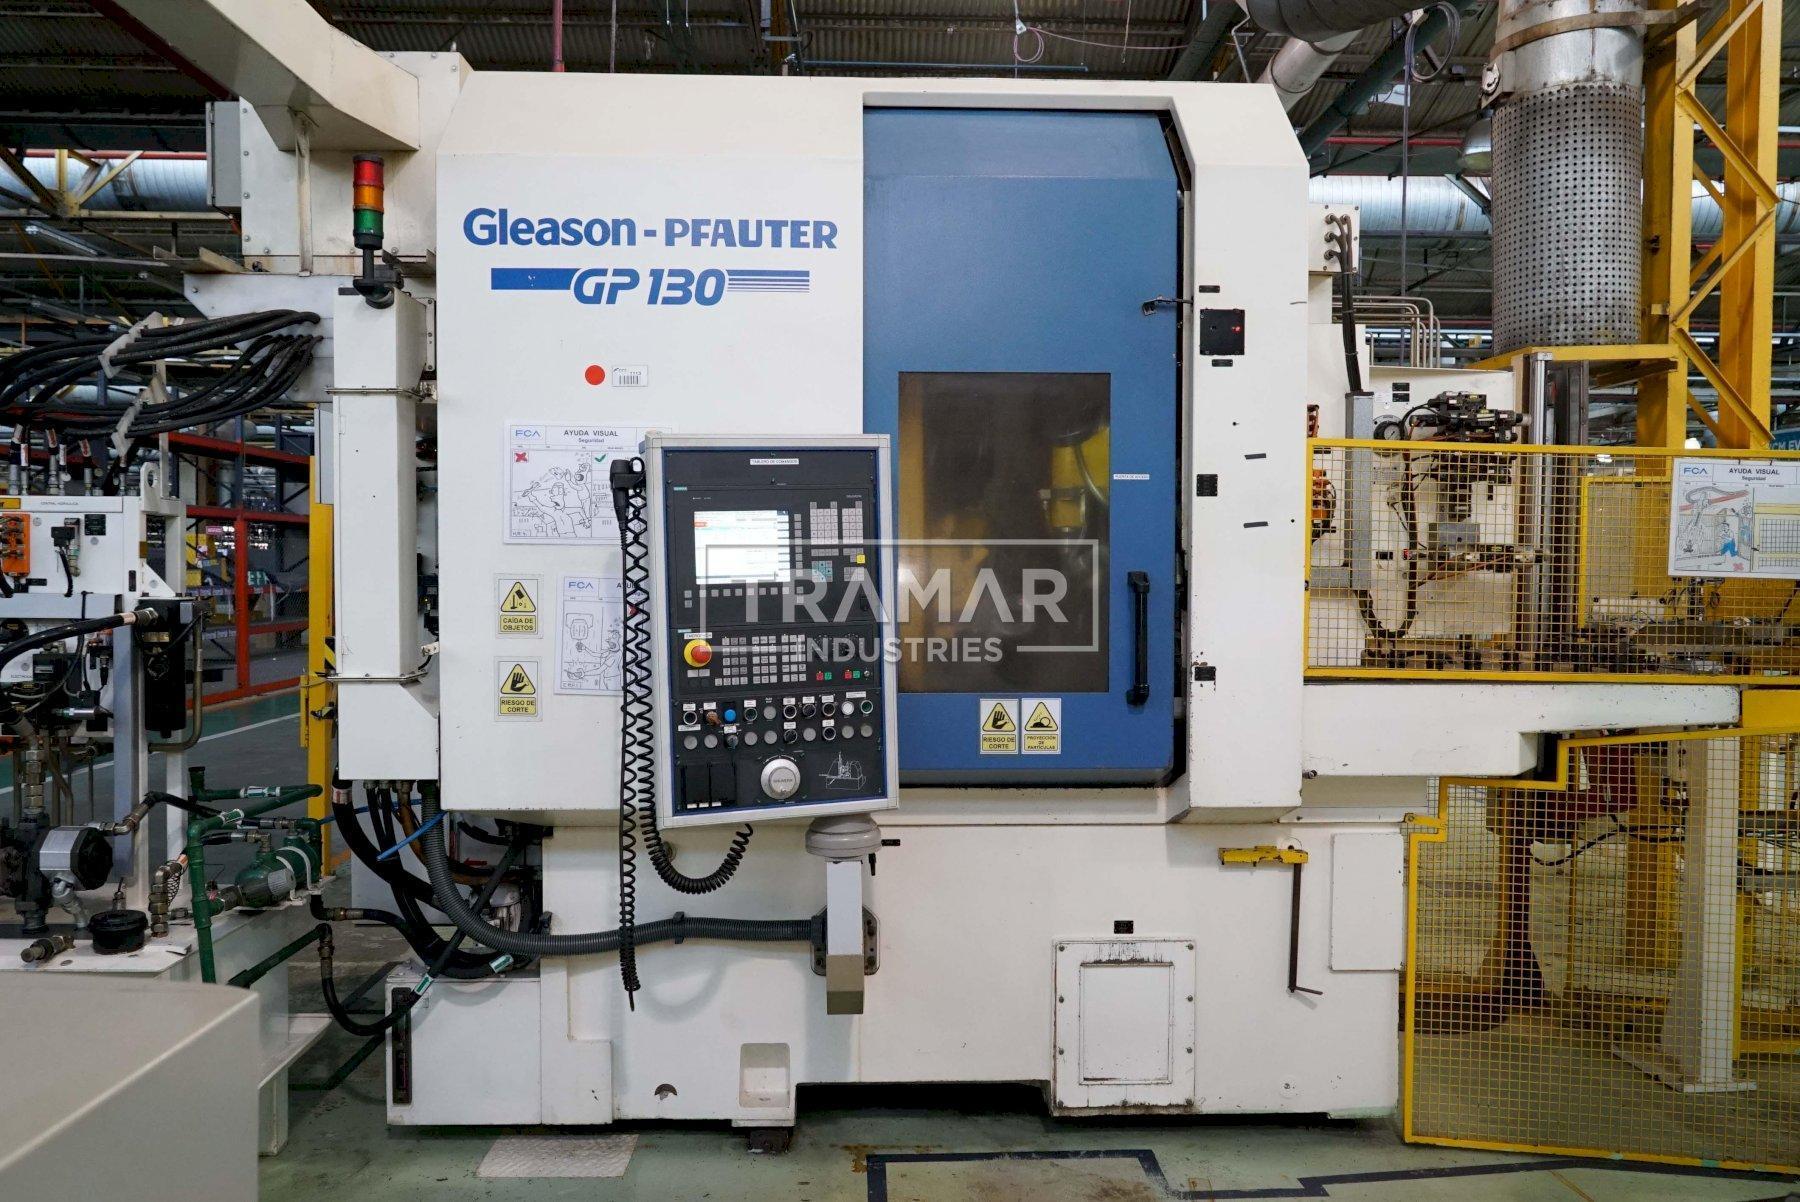 Gleason Pfauter GP130 CNC Gear Hobber (Retrofitted in 2015)